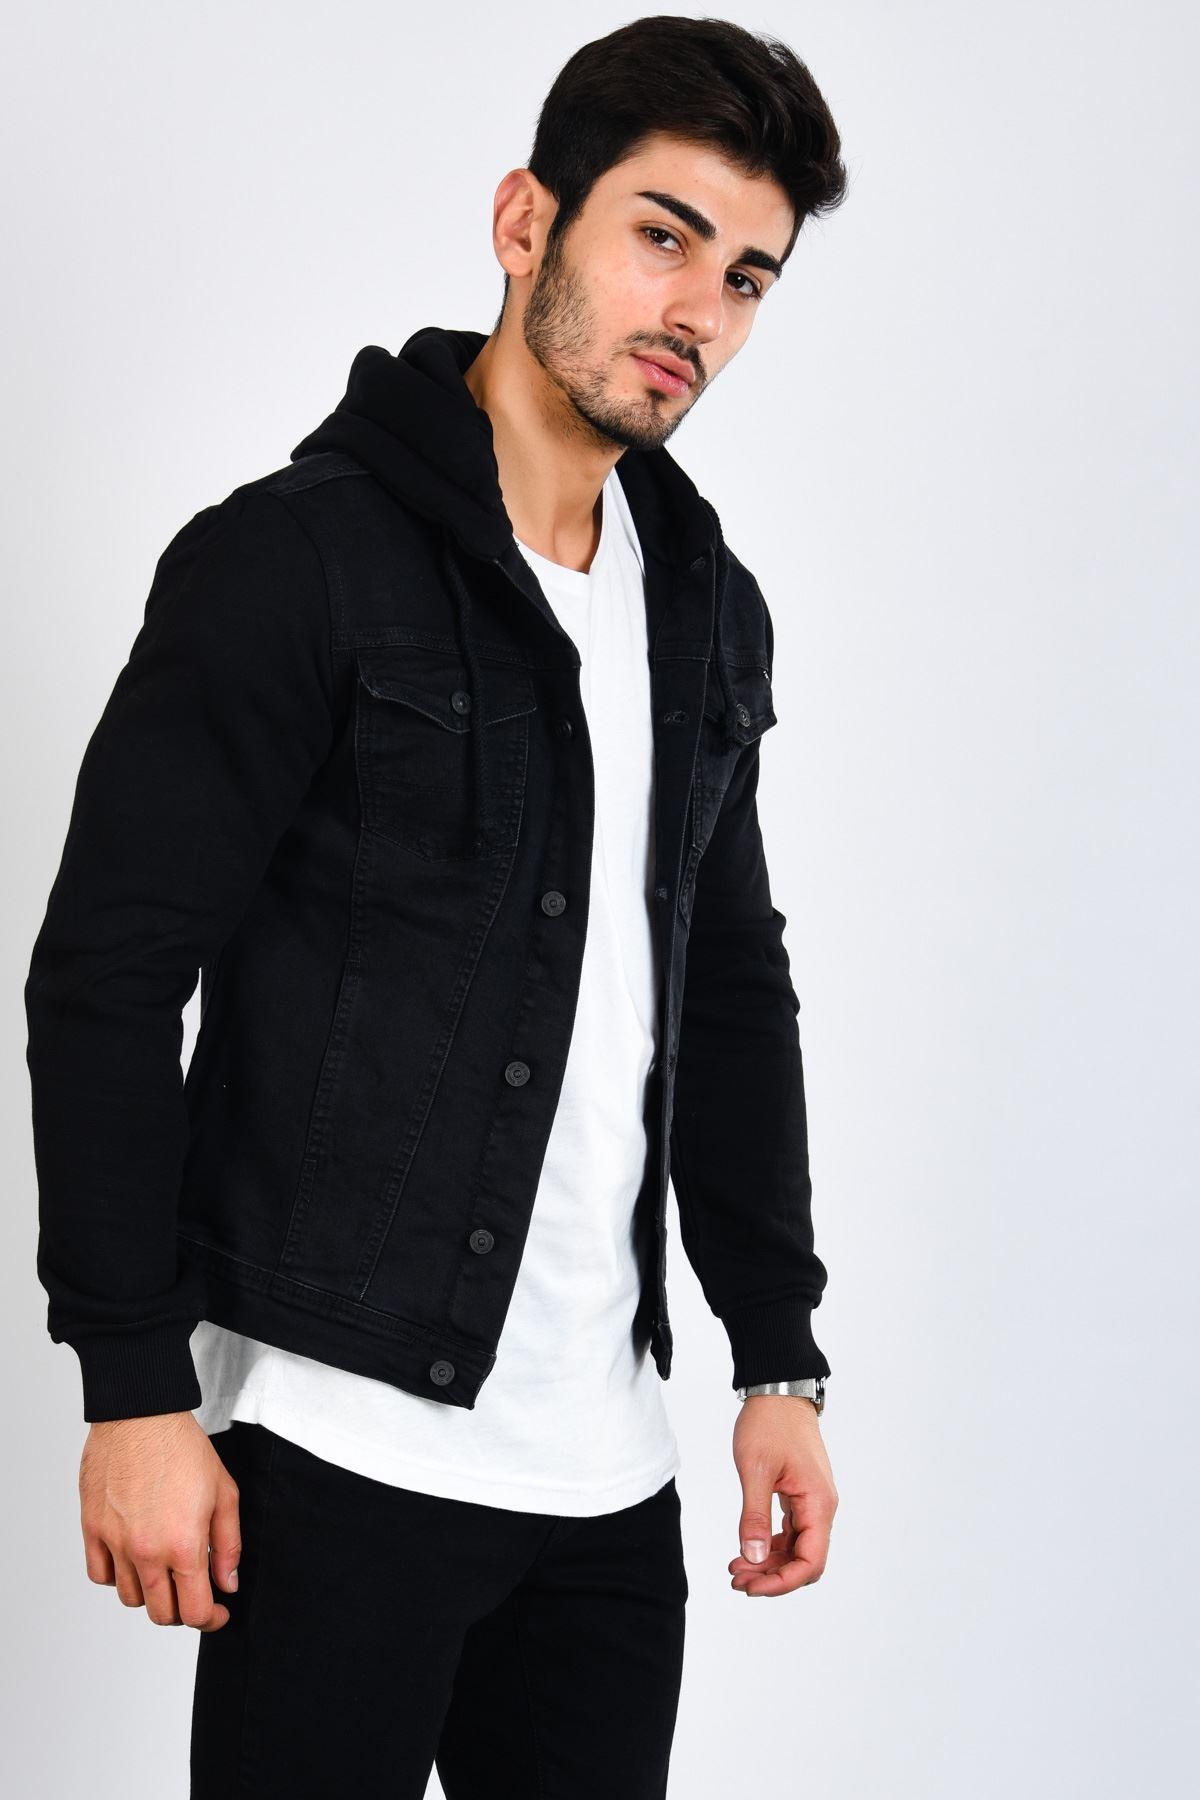 Kol Kapüşon Siyah Erkek Kot Ceket